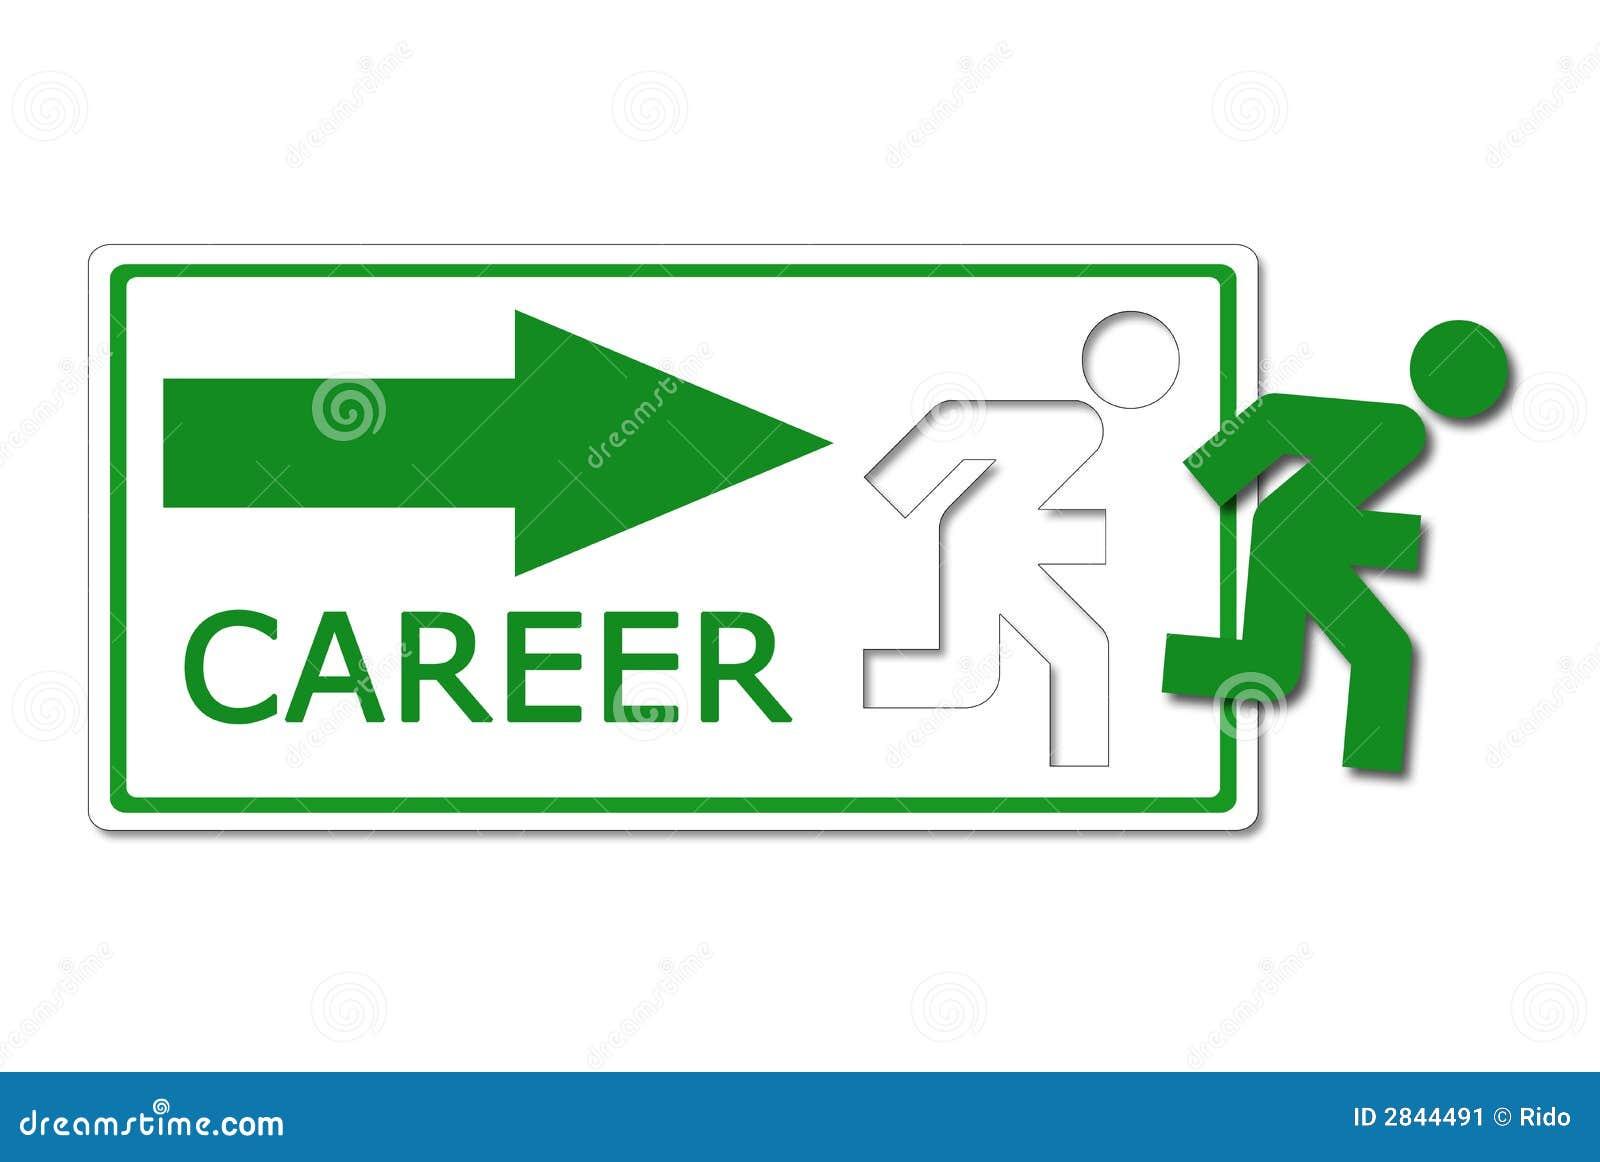 случай иконы карьеры